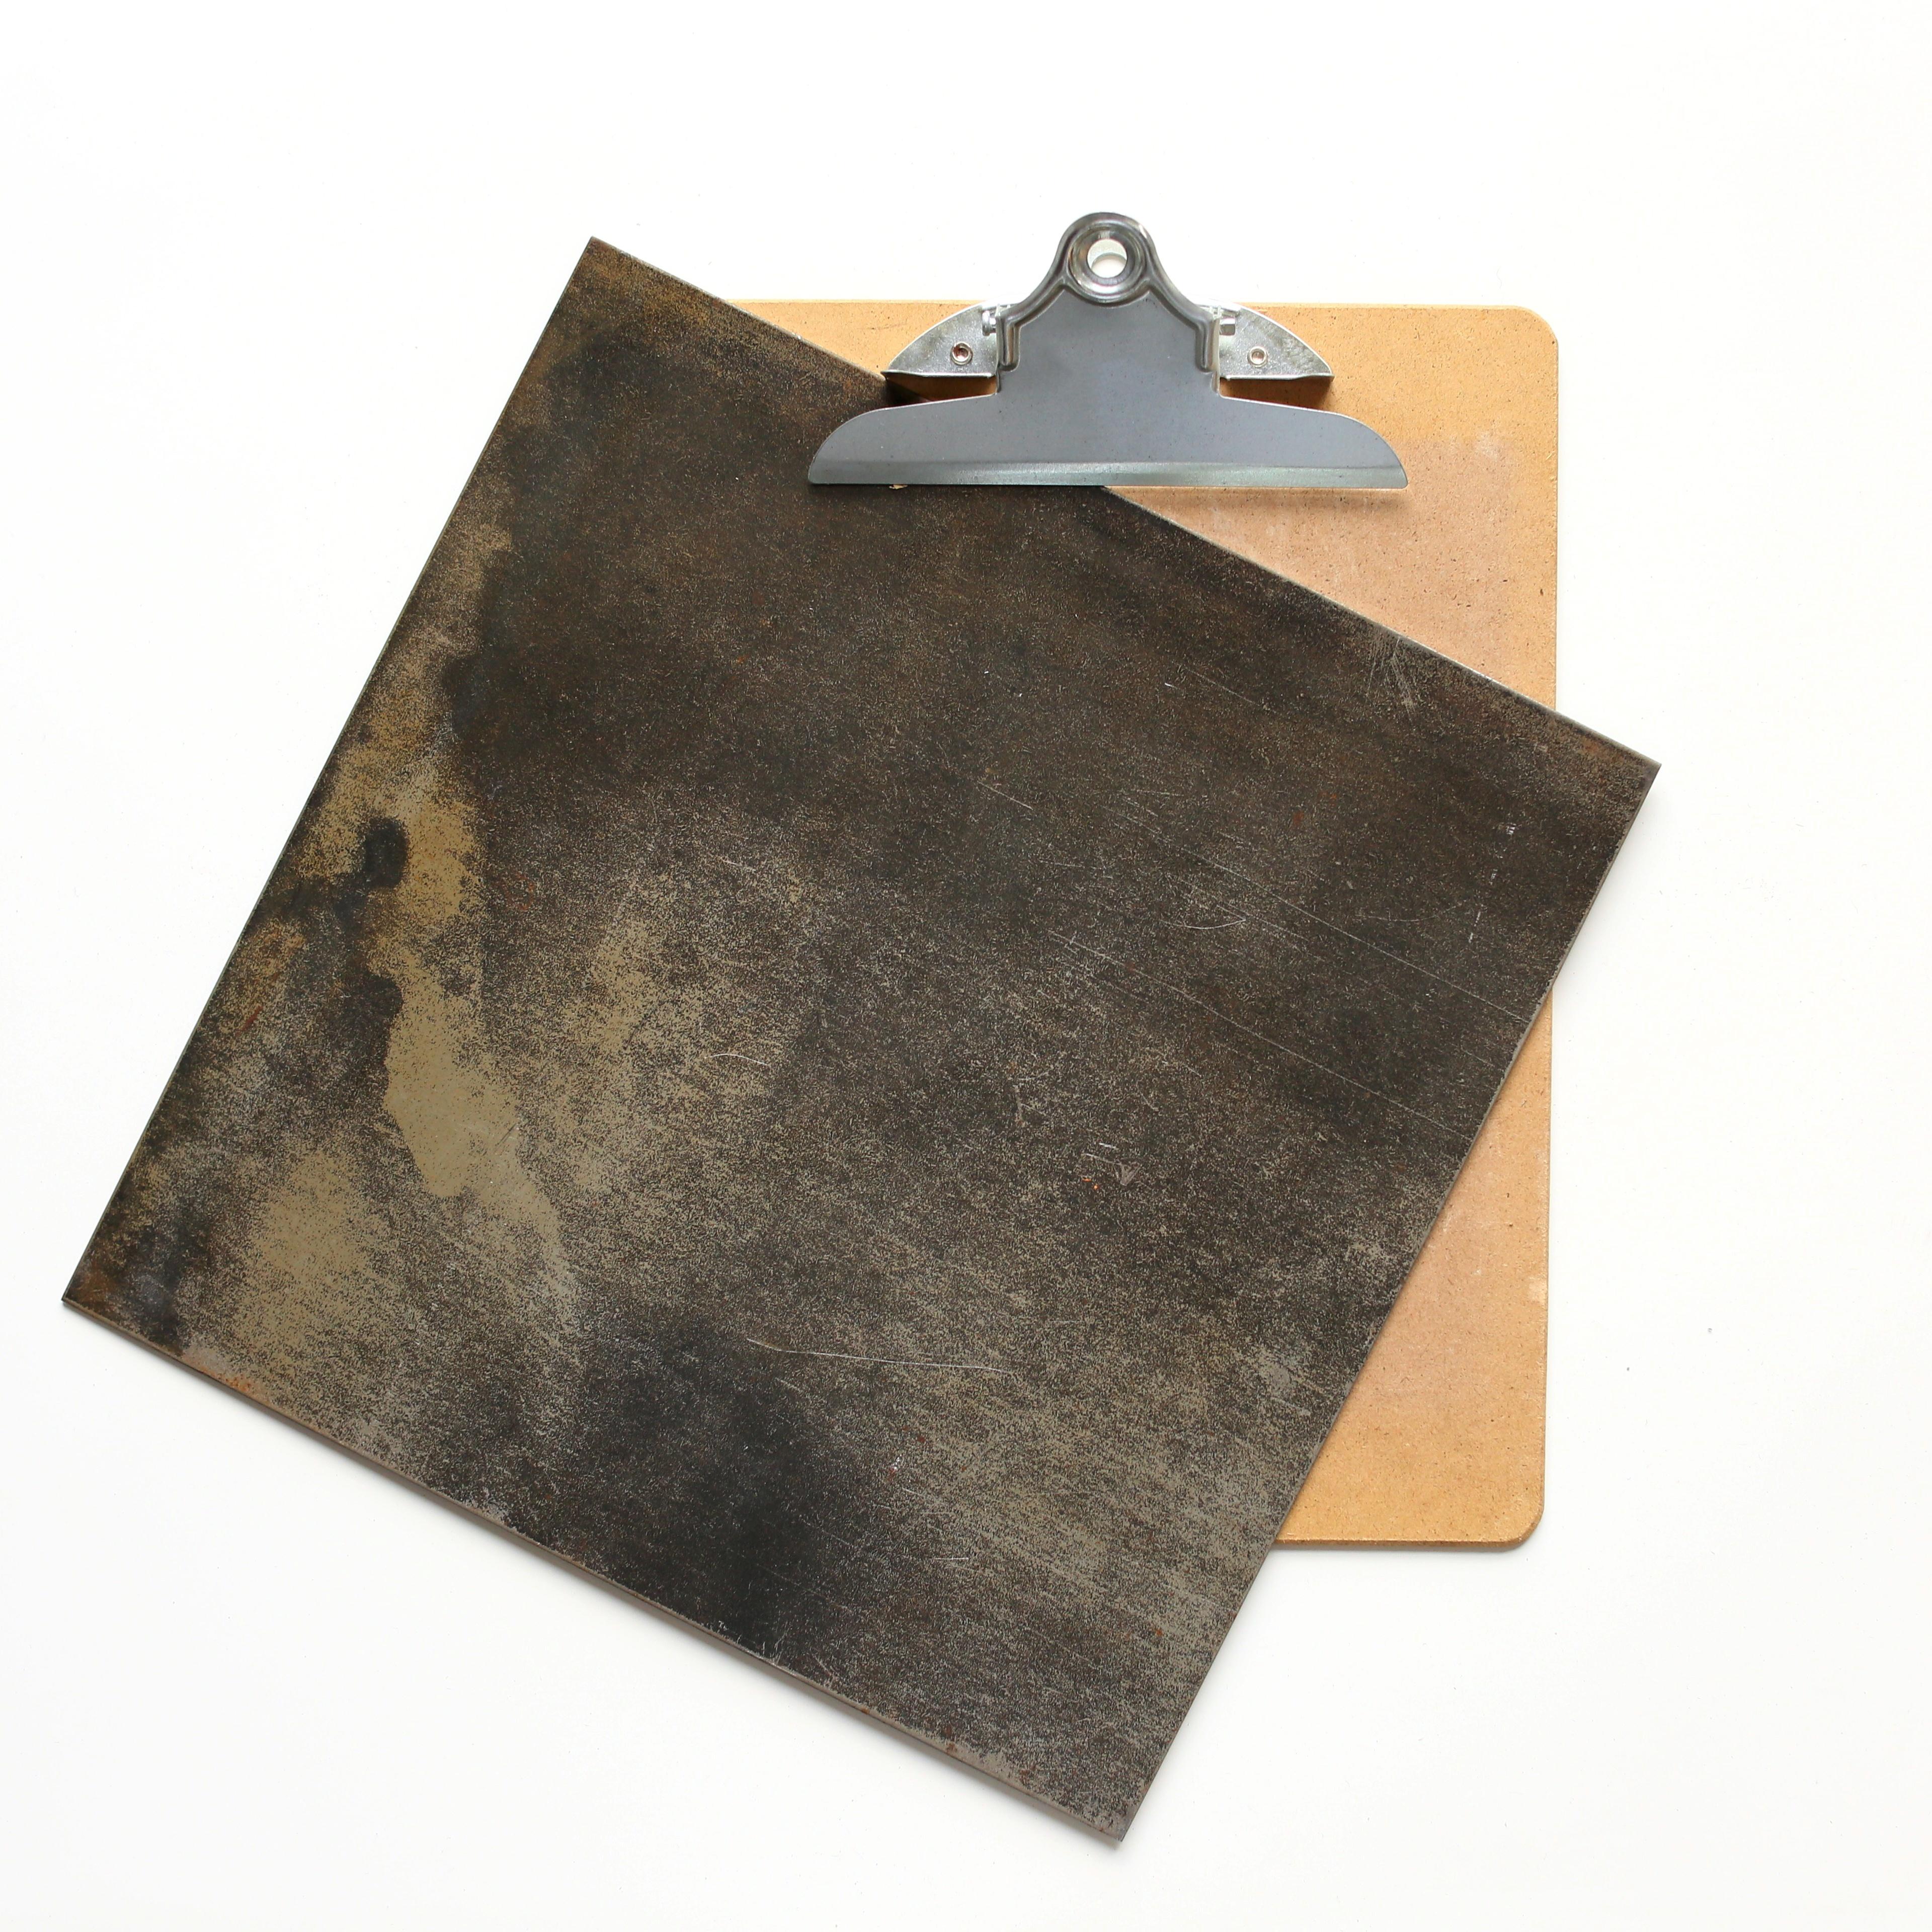 whitmarsh_steel_clipboard.jpg